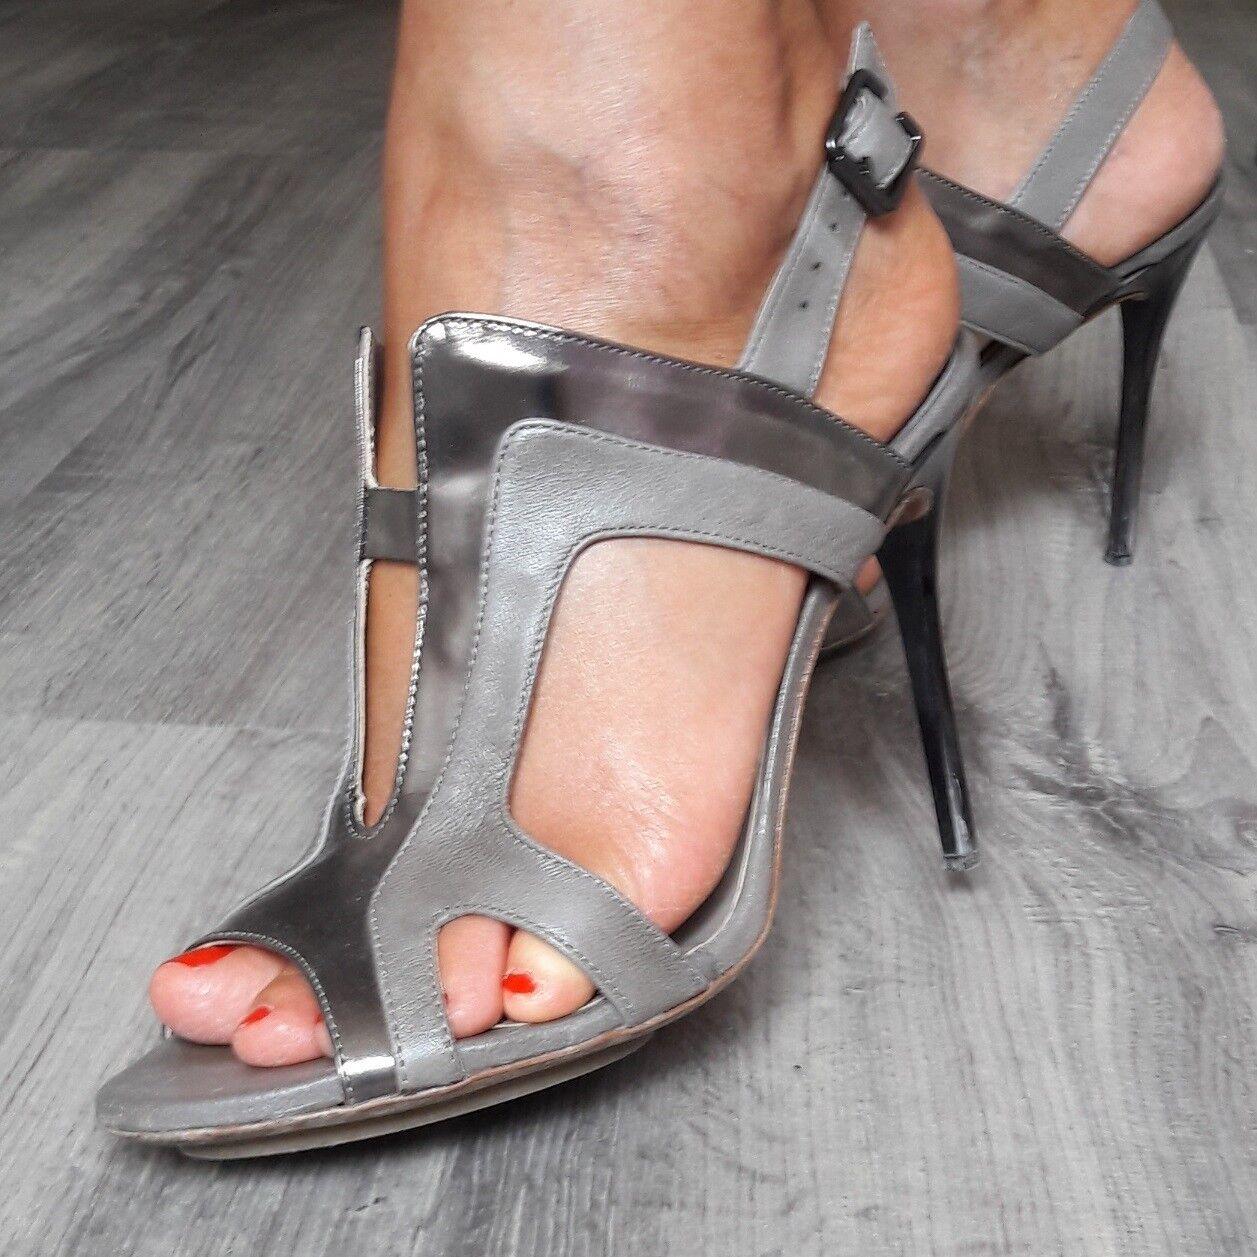 Sandali donna Ixos CLOEE/CAPSELLA colore grigio+canna fucile n. 39 tacco 11 cm